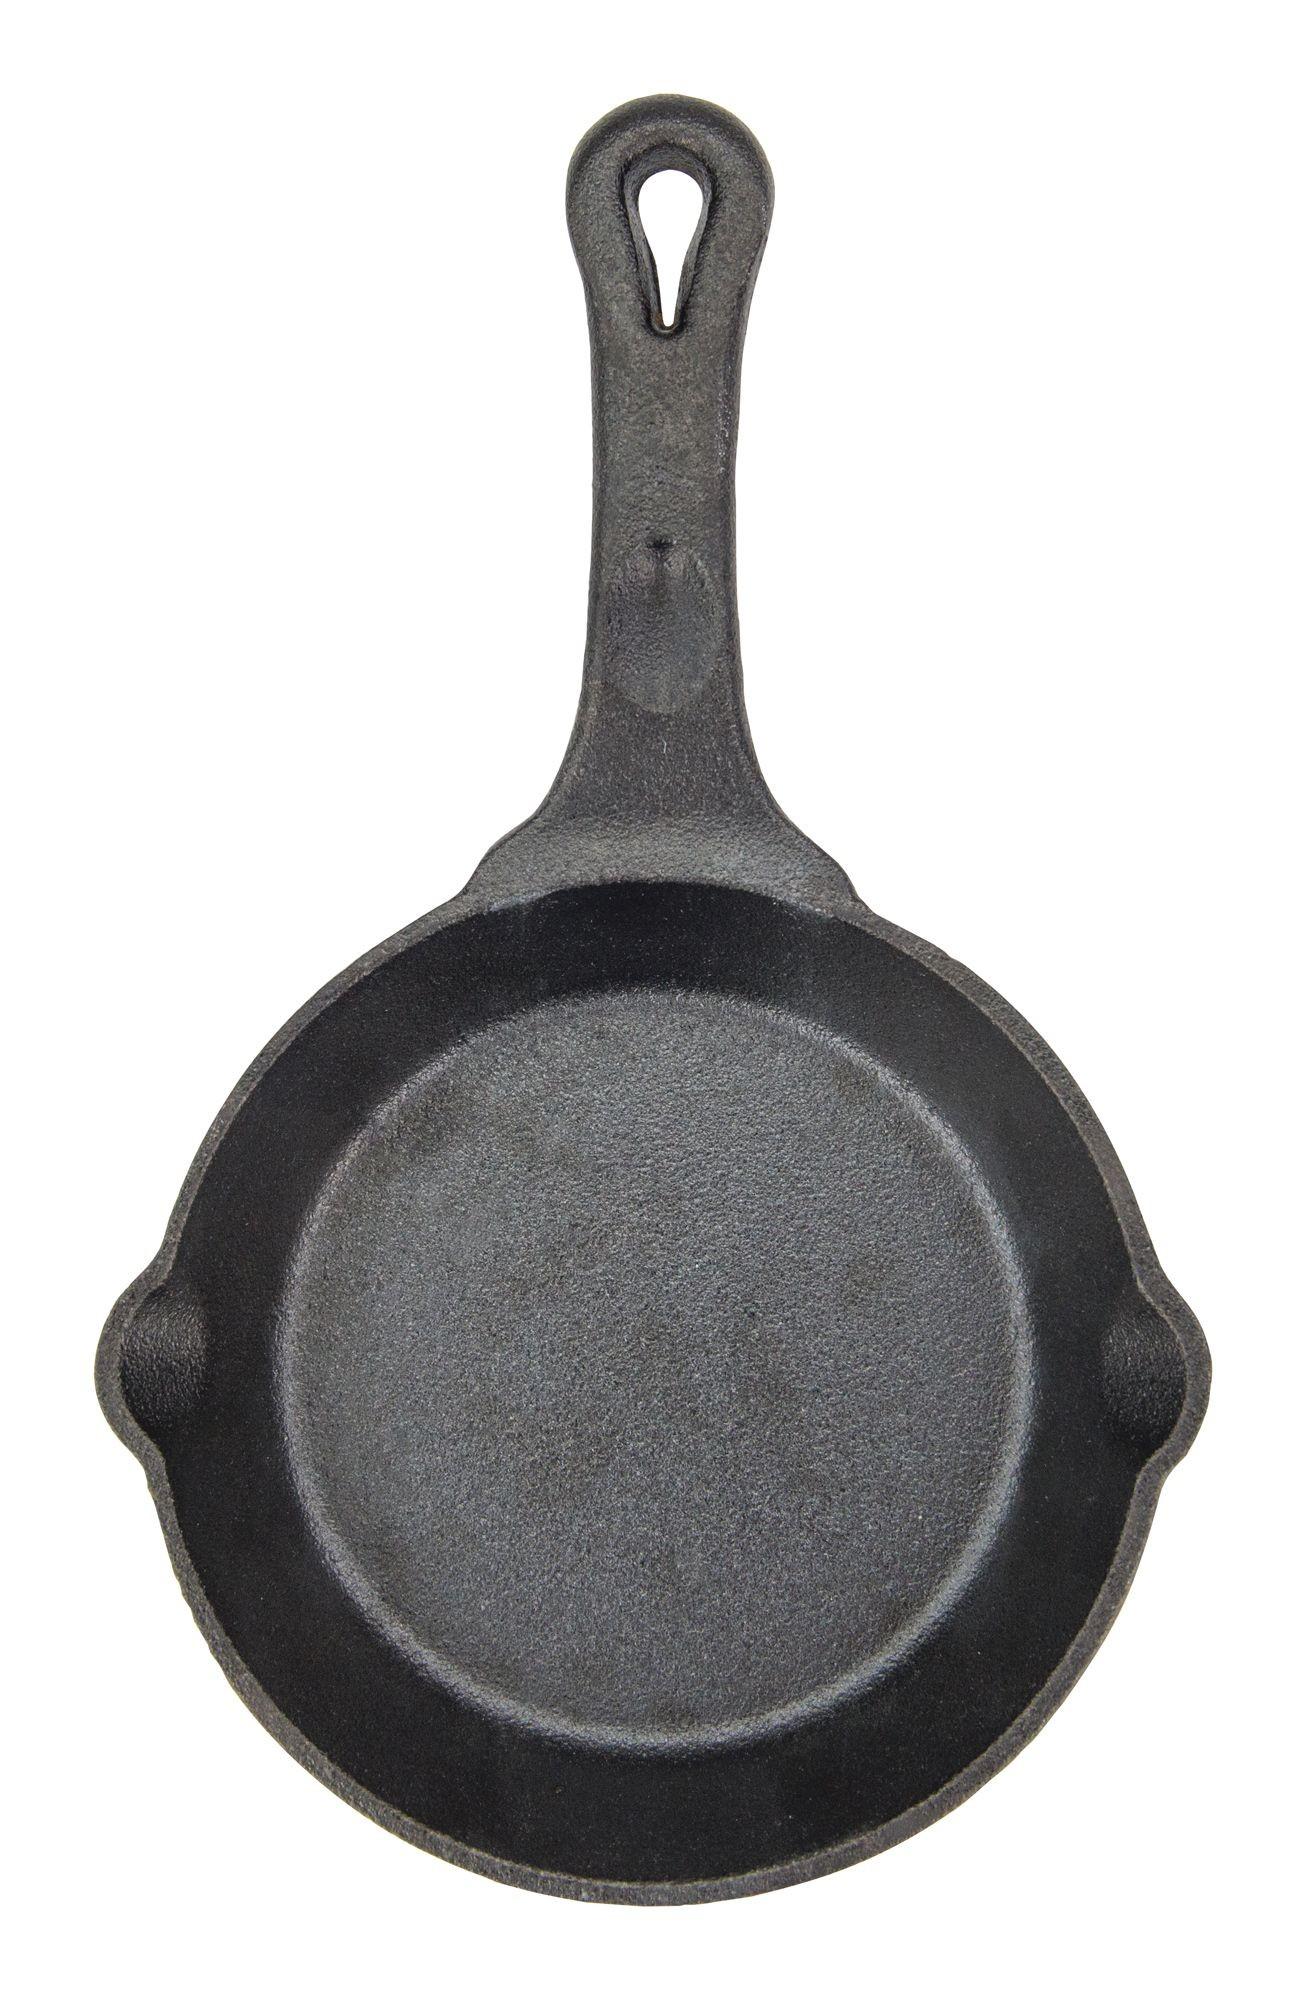 Black WINCO 6 Cast Iron Skillet